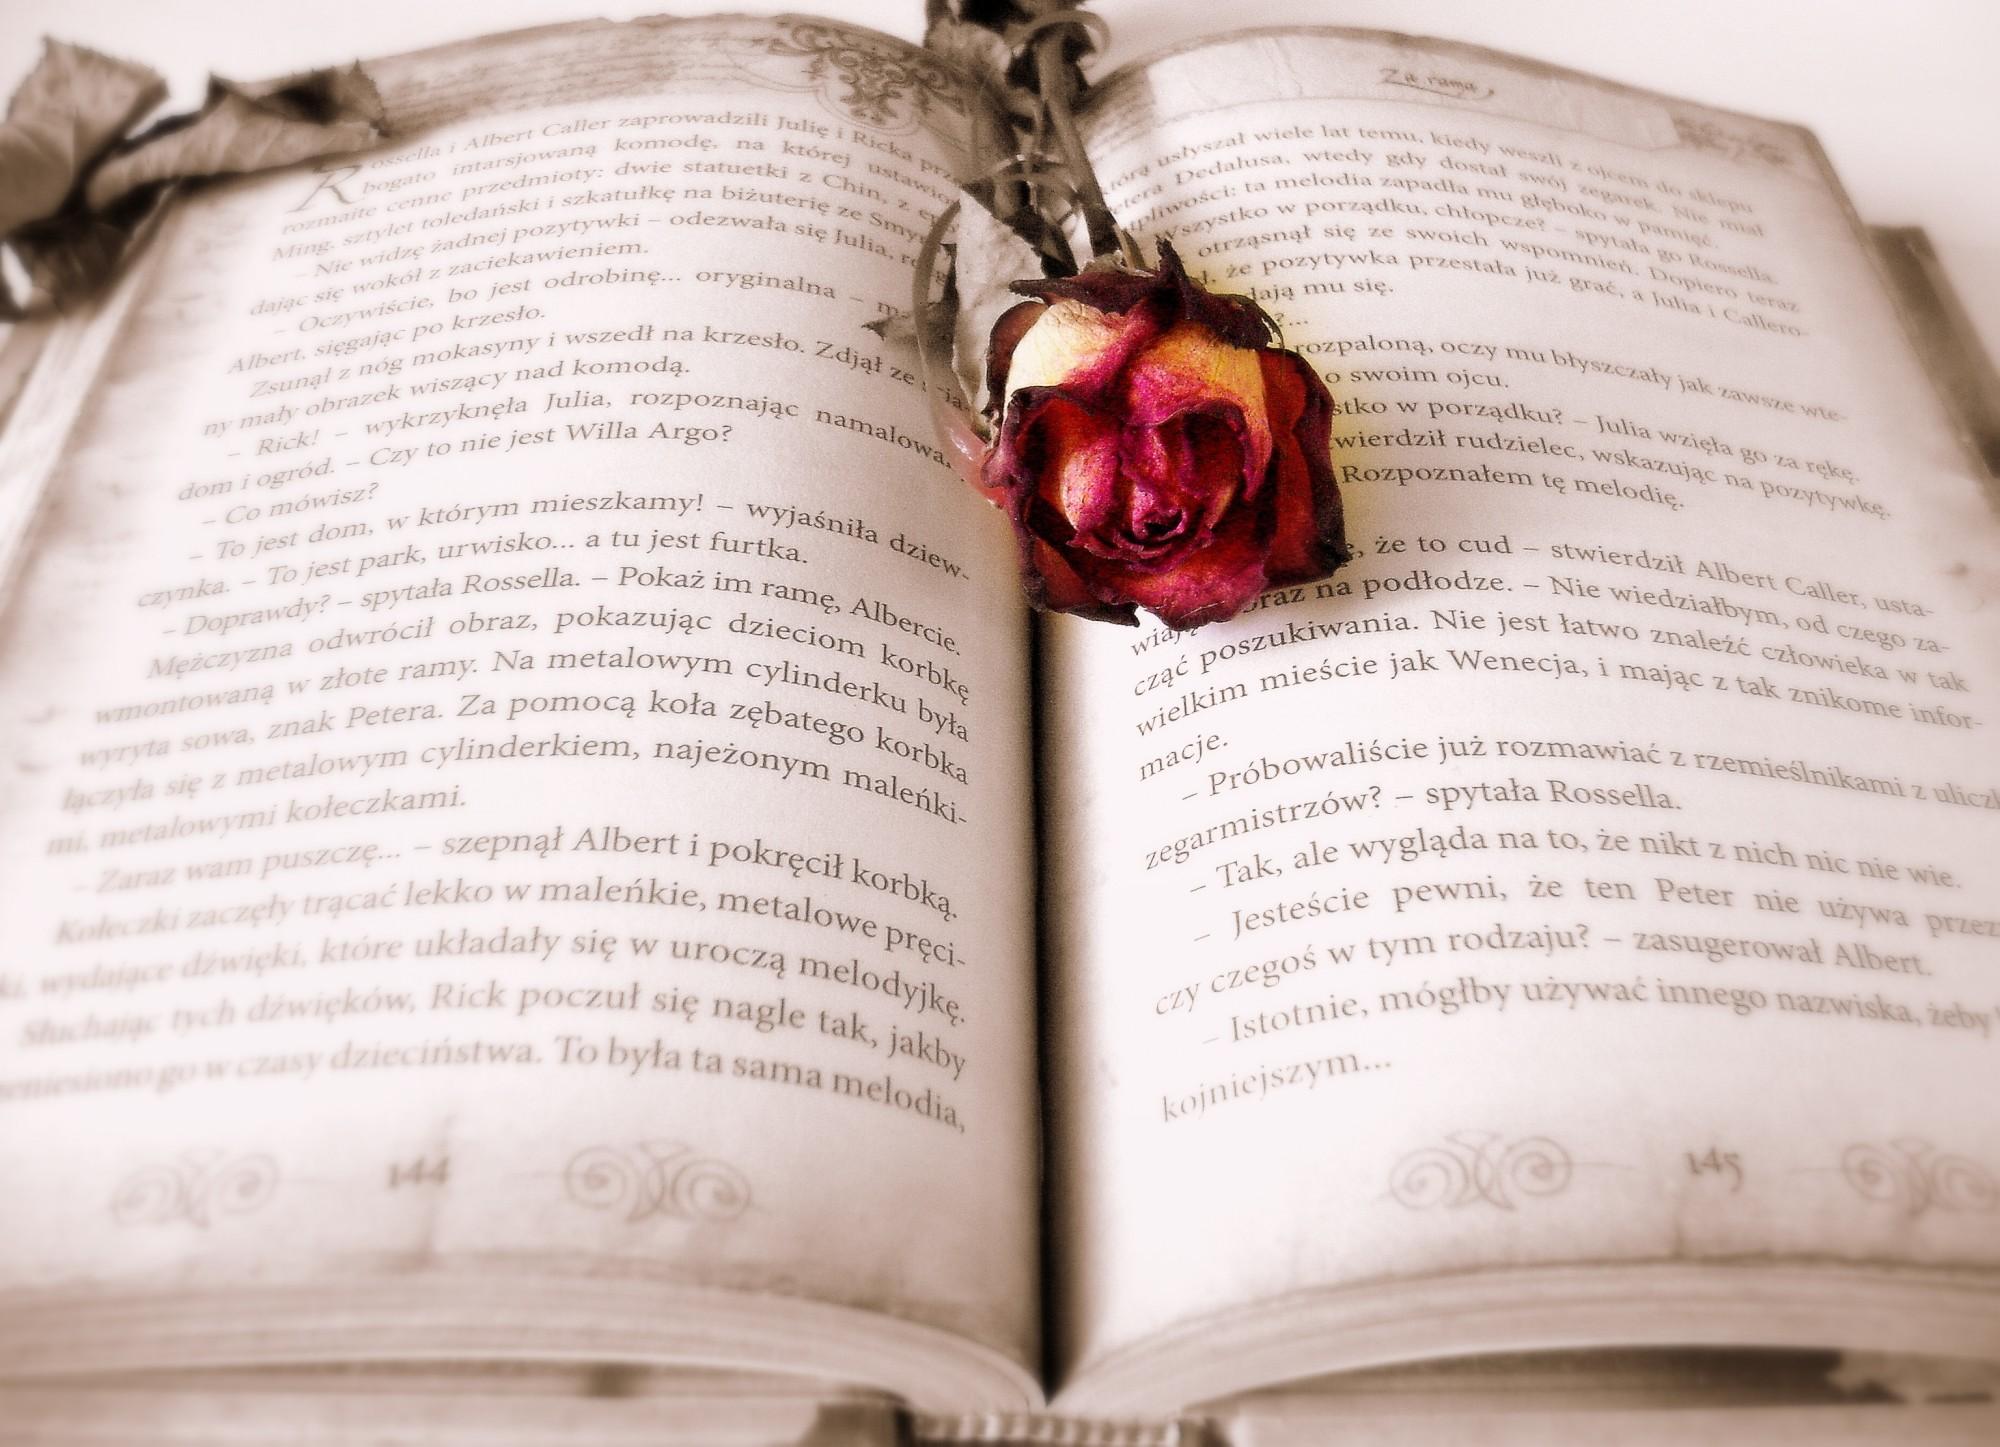 10 Cliches We Love in Trashy Romance Novels